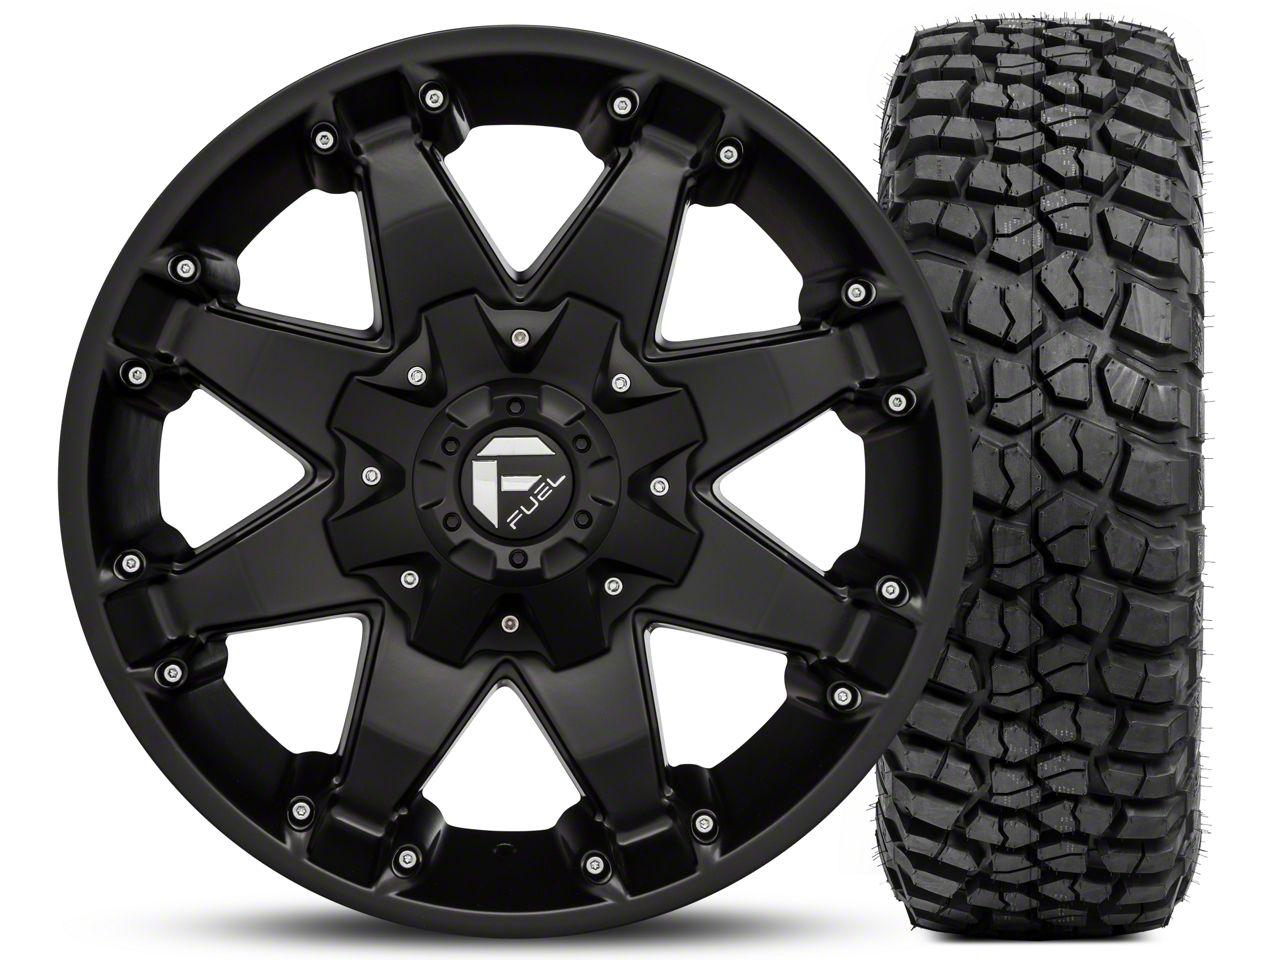 Fuel Wheels Octane Matte Black 17x8.5 and BF Goodrich Mud Terrain T/A KM2 35x12.50R17 Kit (07-18 Jeep Wrangler JK; 2018 Jeep Wrangler JL)